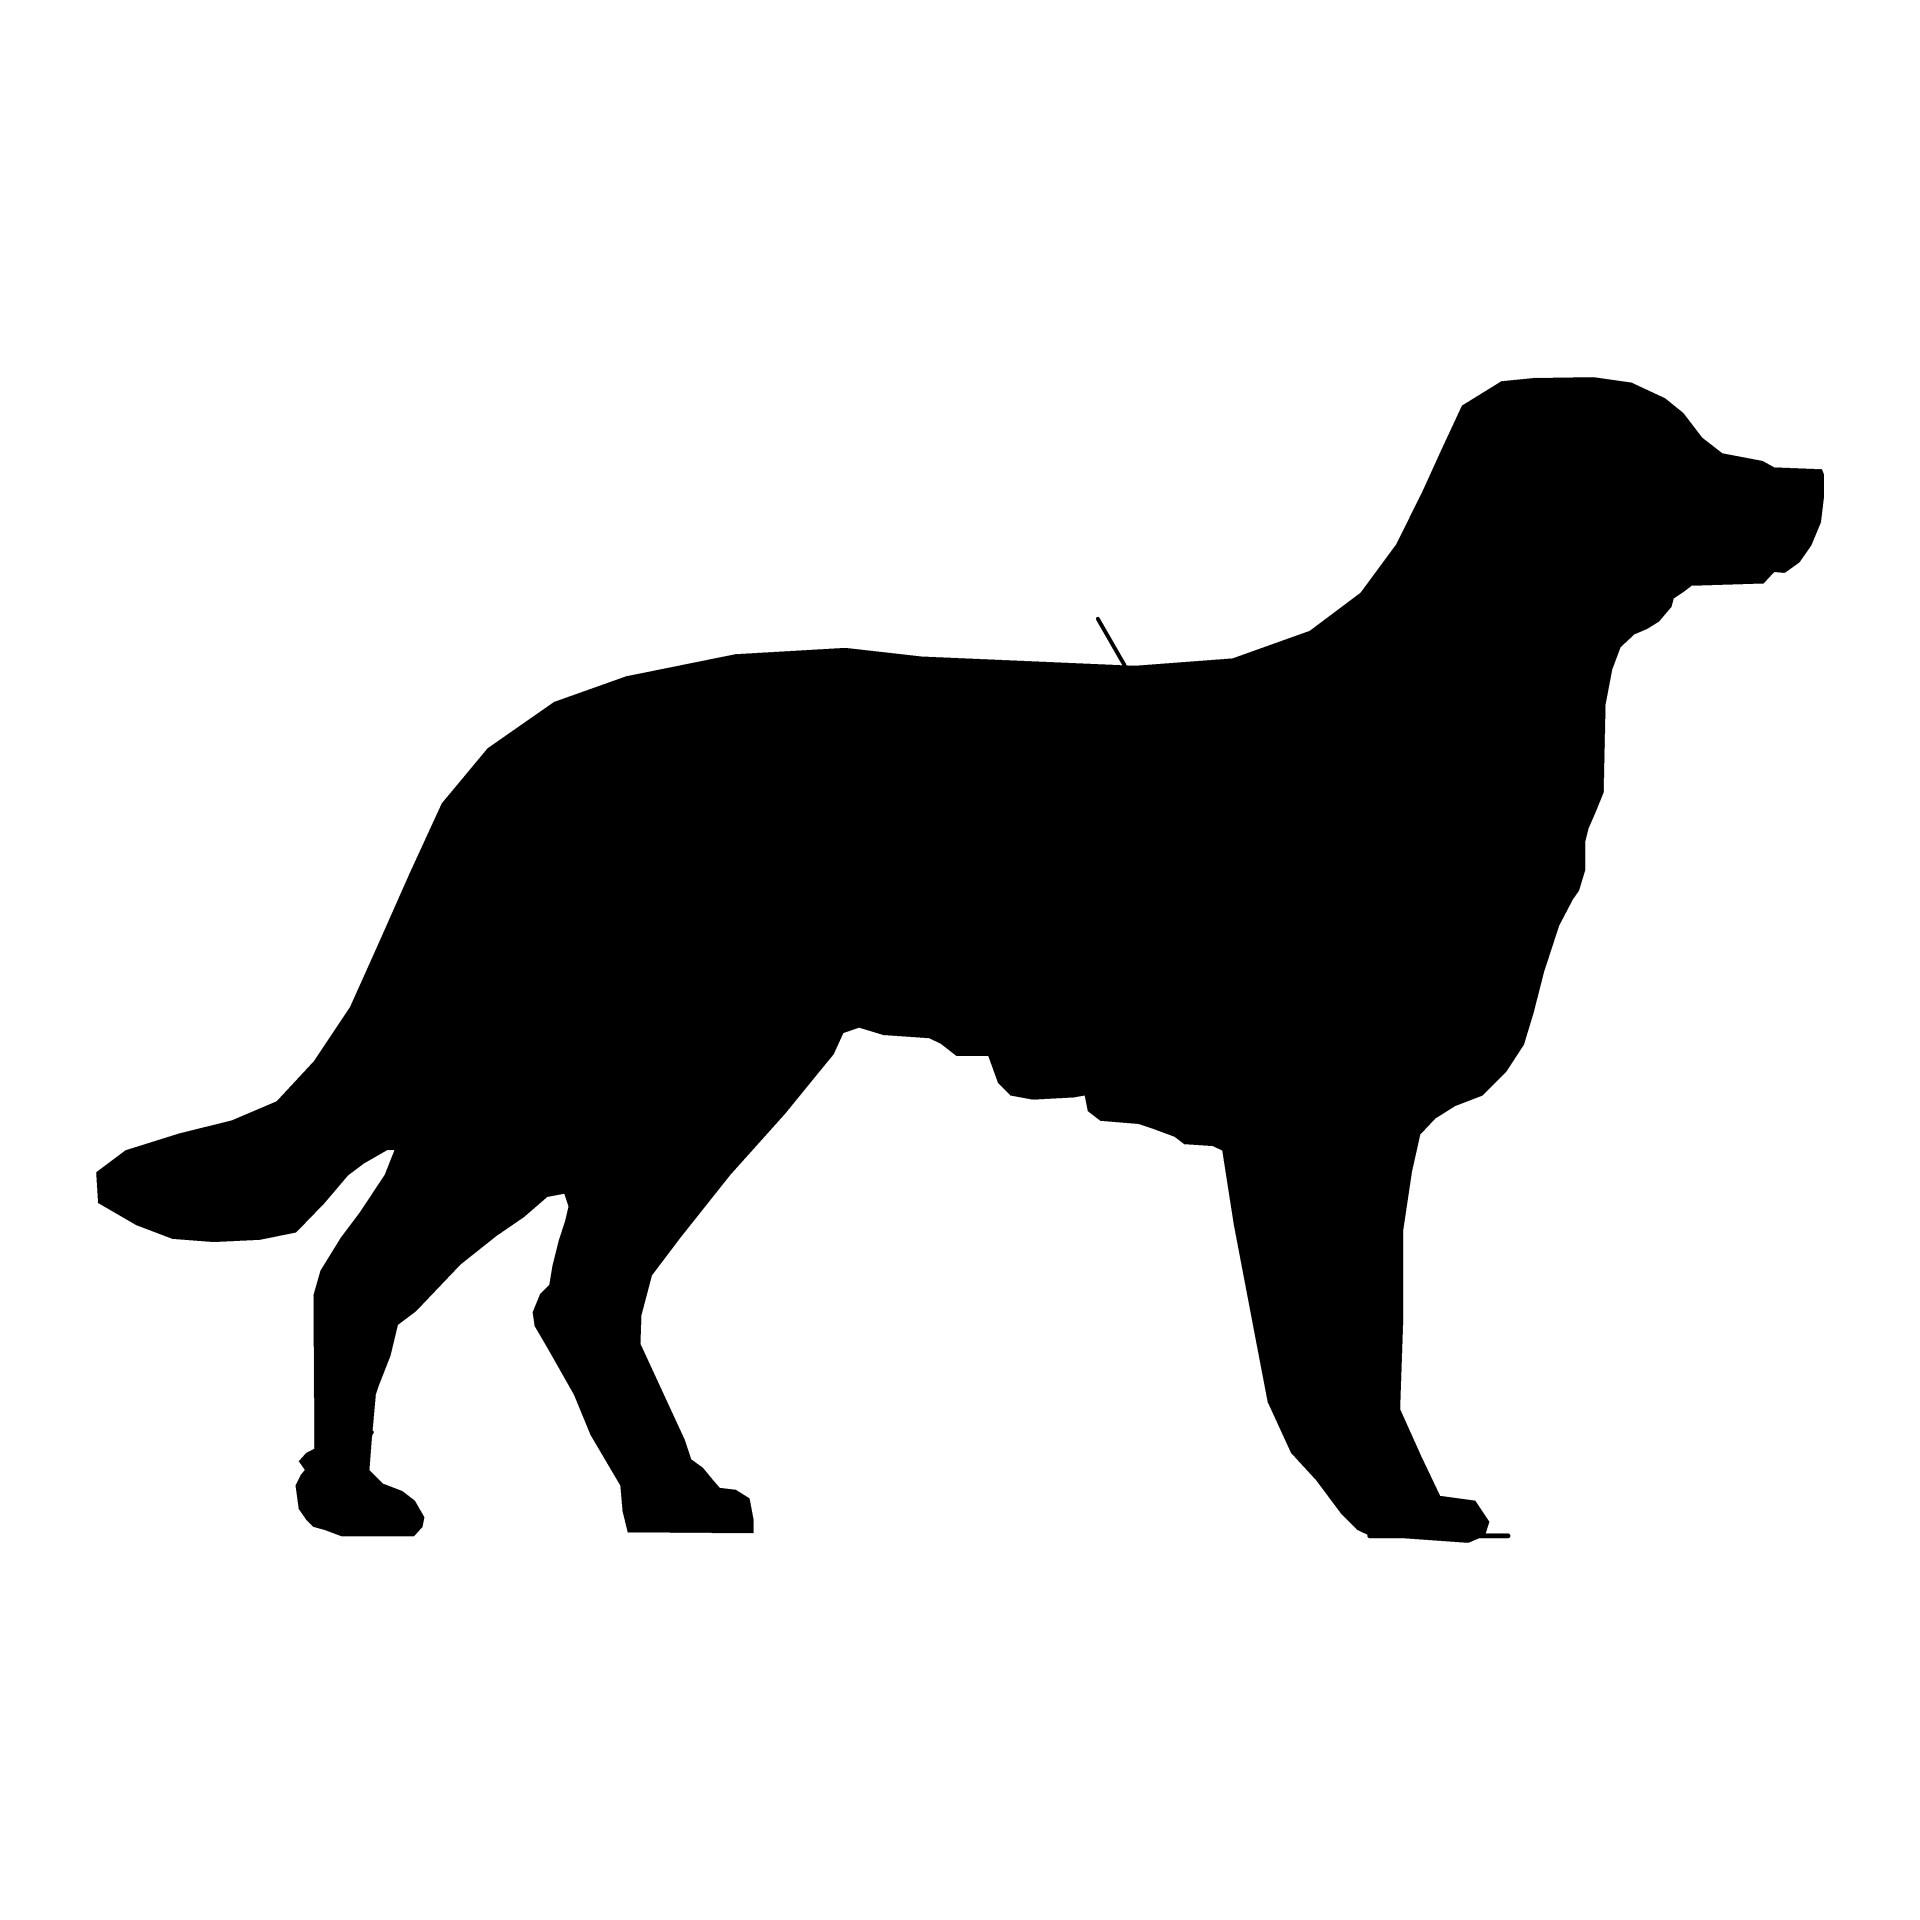 1920x1920 Dog Silhouette Pics